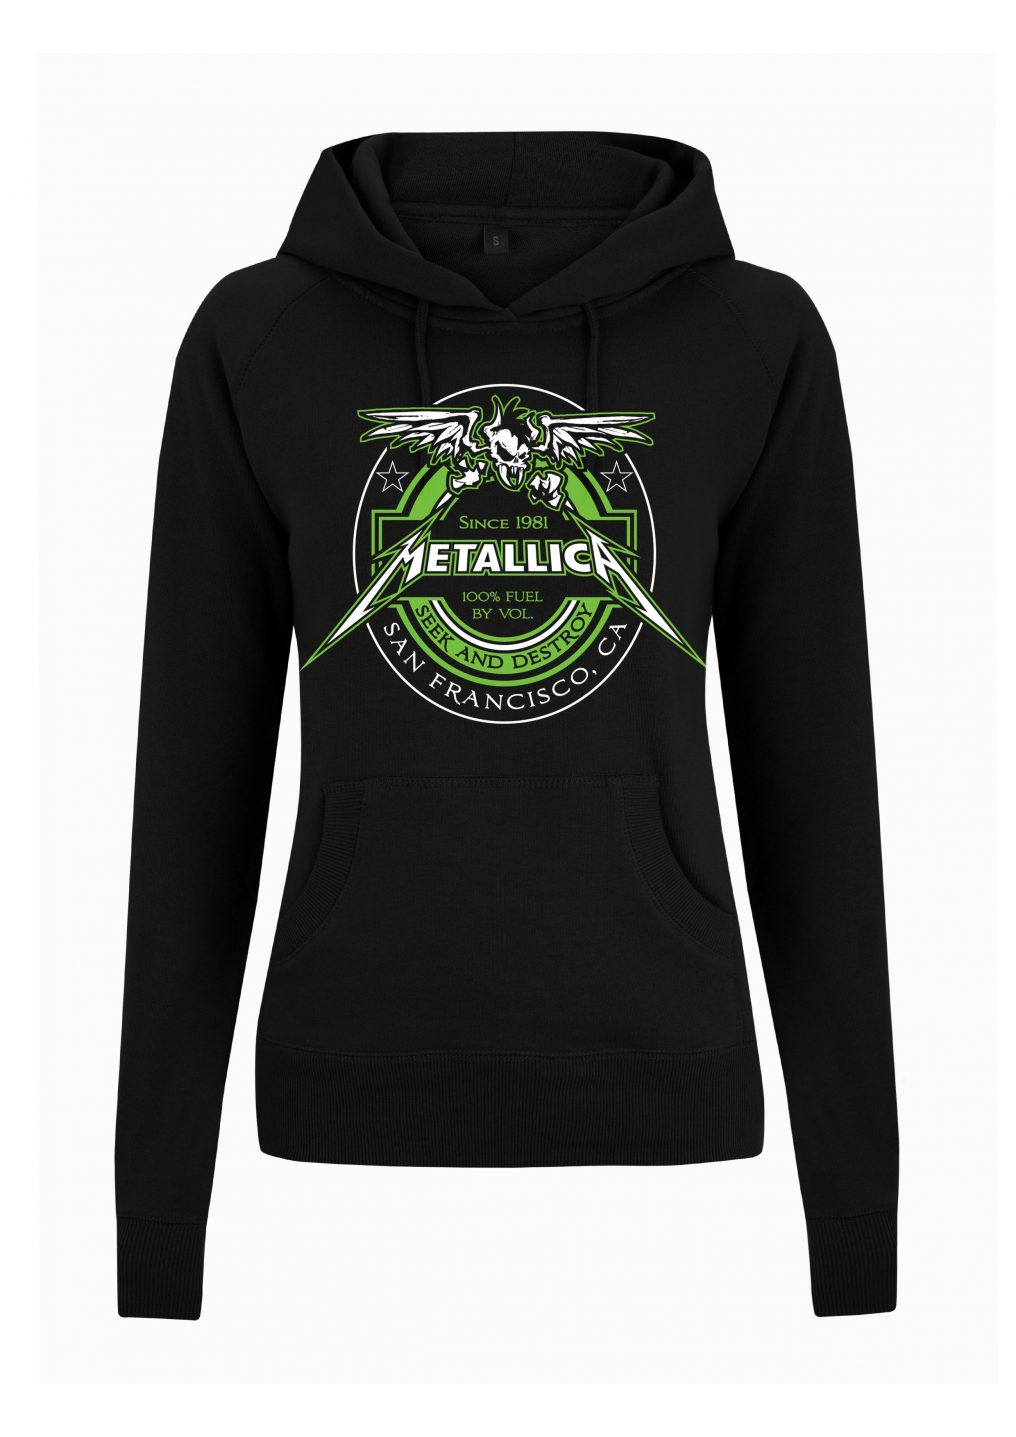 rtmtlpgbfue-metallica-fuel-black-ladies-pullover-hood